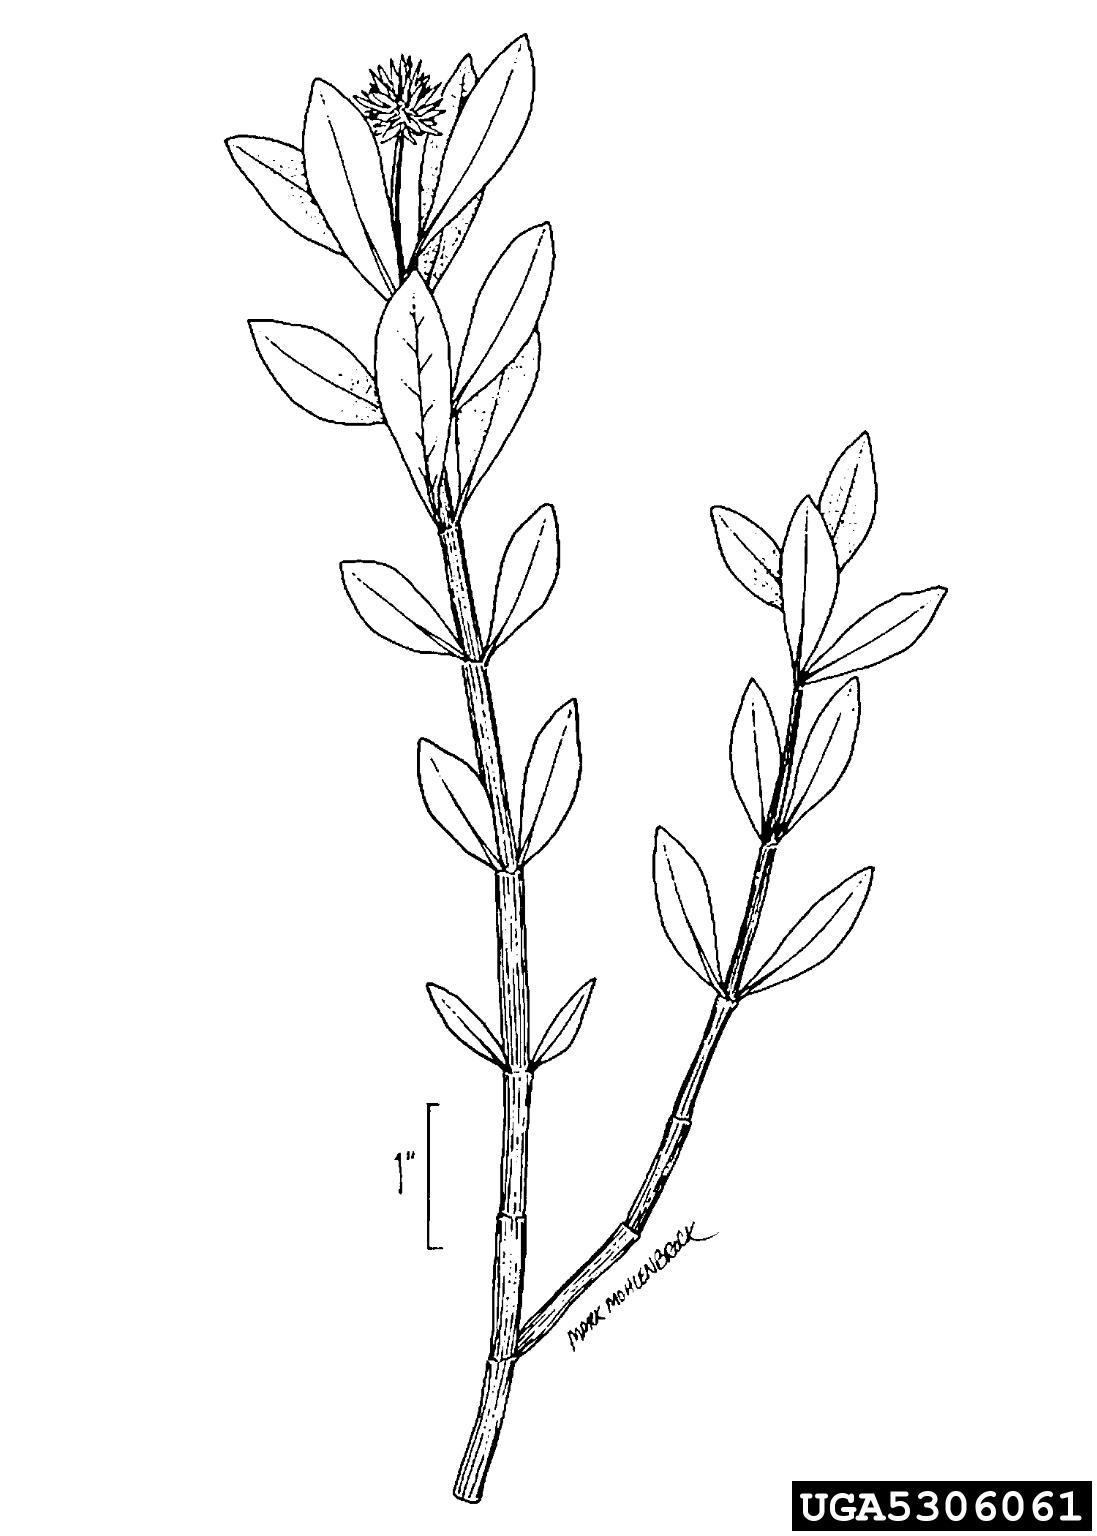 Alligatorweed Alternanthera Philoxeroides Caryophyllales